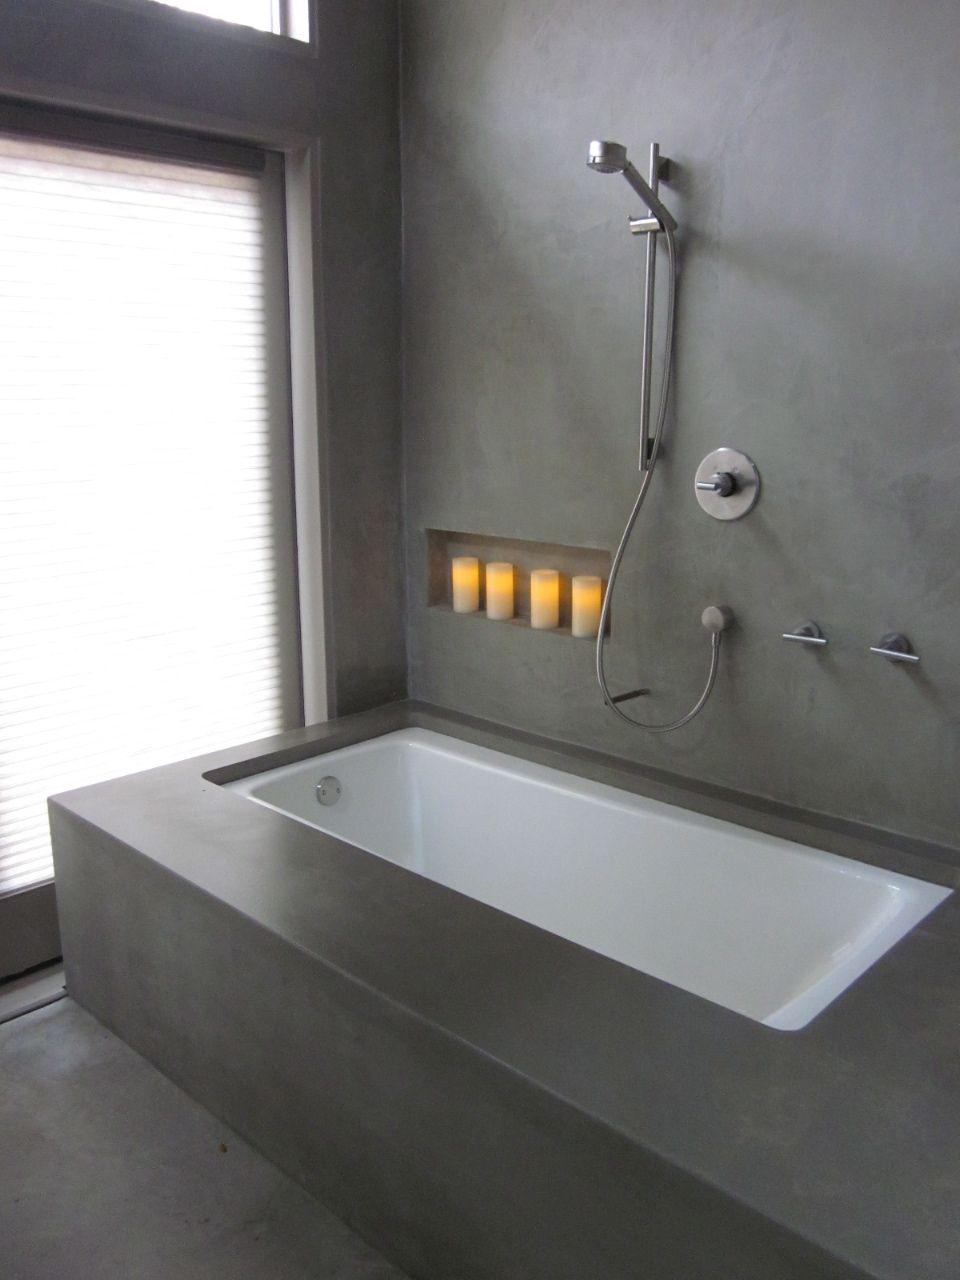 Bathroom Tile Tub Surround Replacement Liners Inserts Fiberglass Repair  Small Paint Miracle Method Refinish Shower Doors Resurfacing Refinishing  Bathtub ...